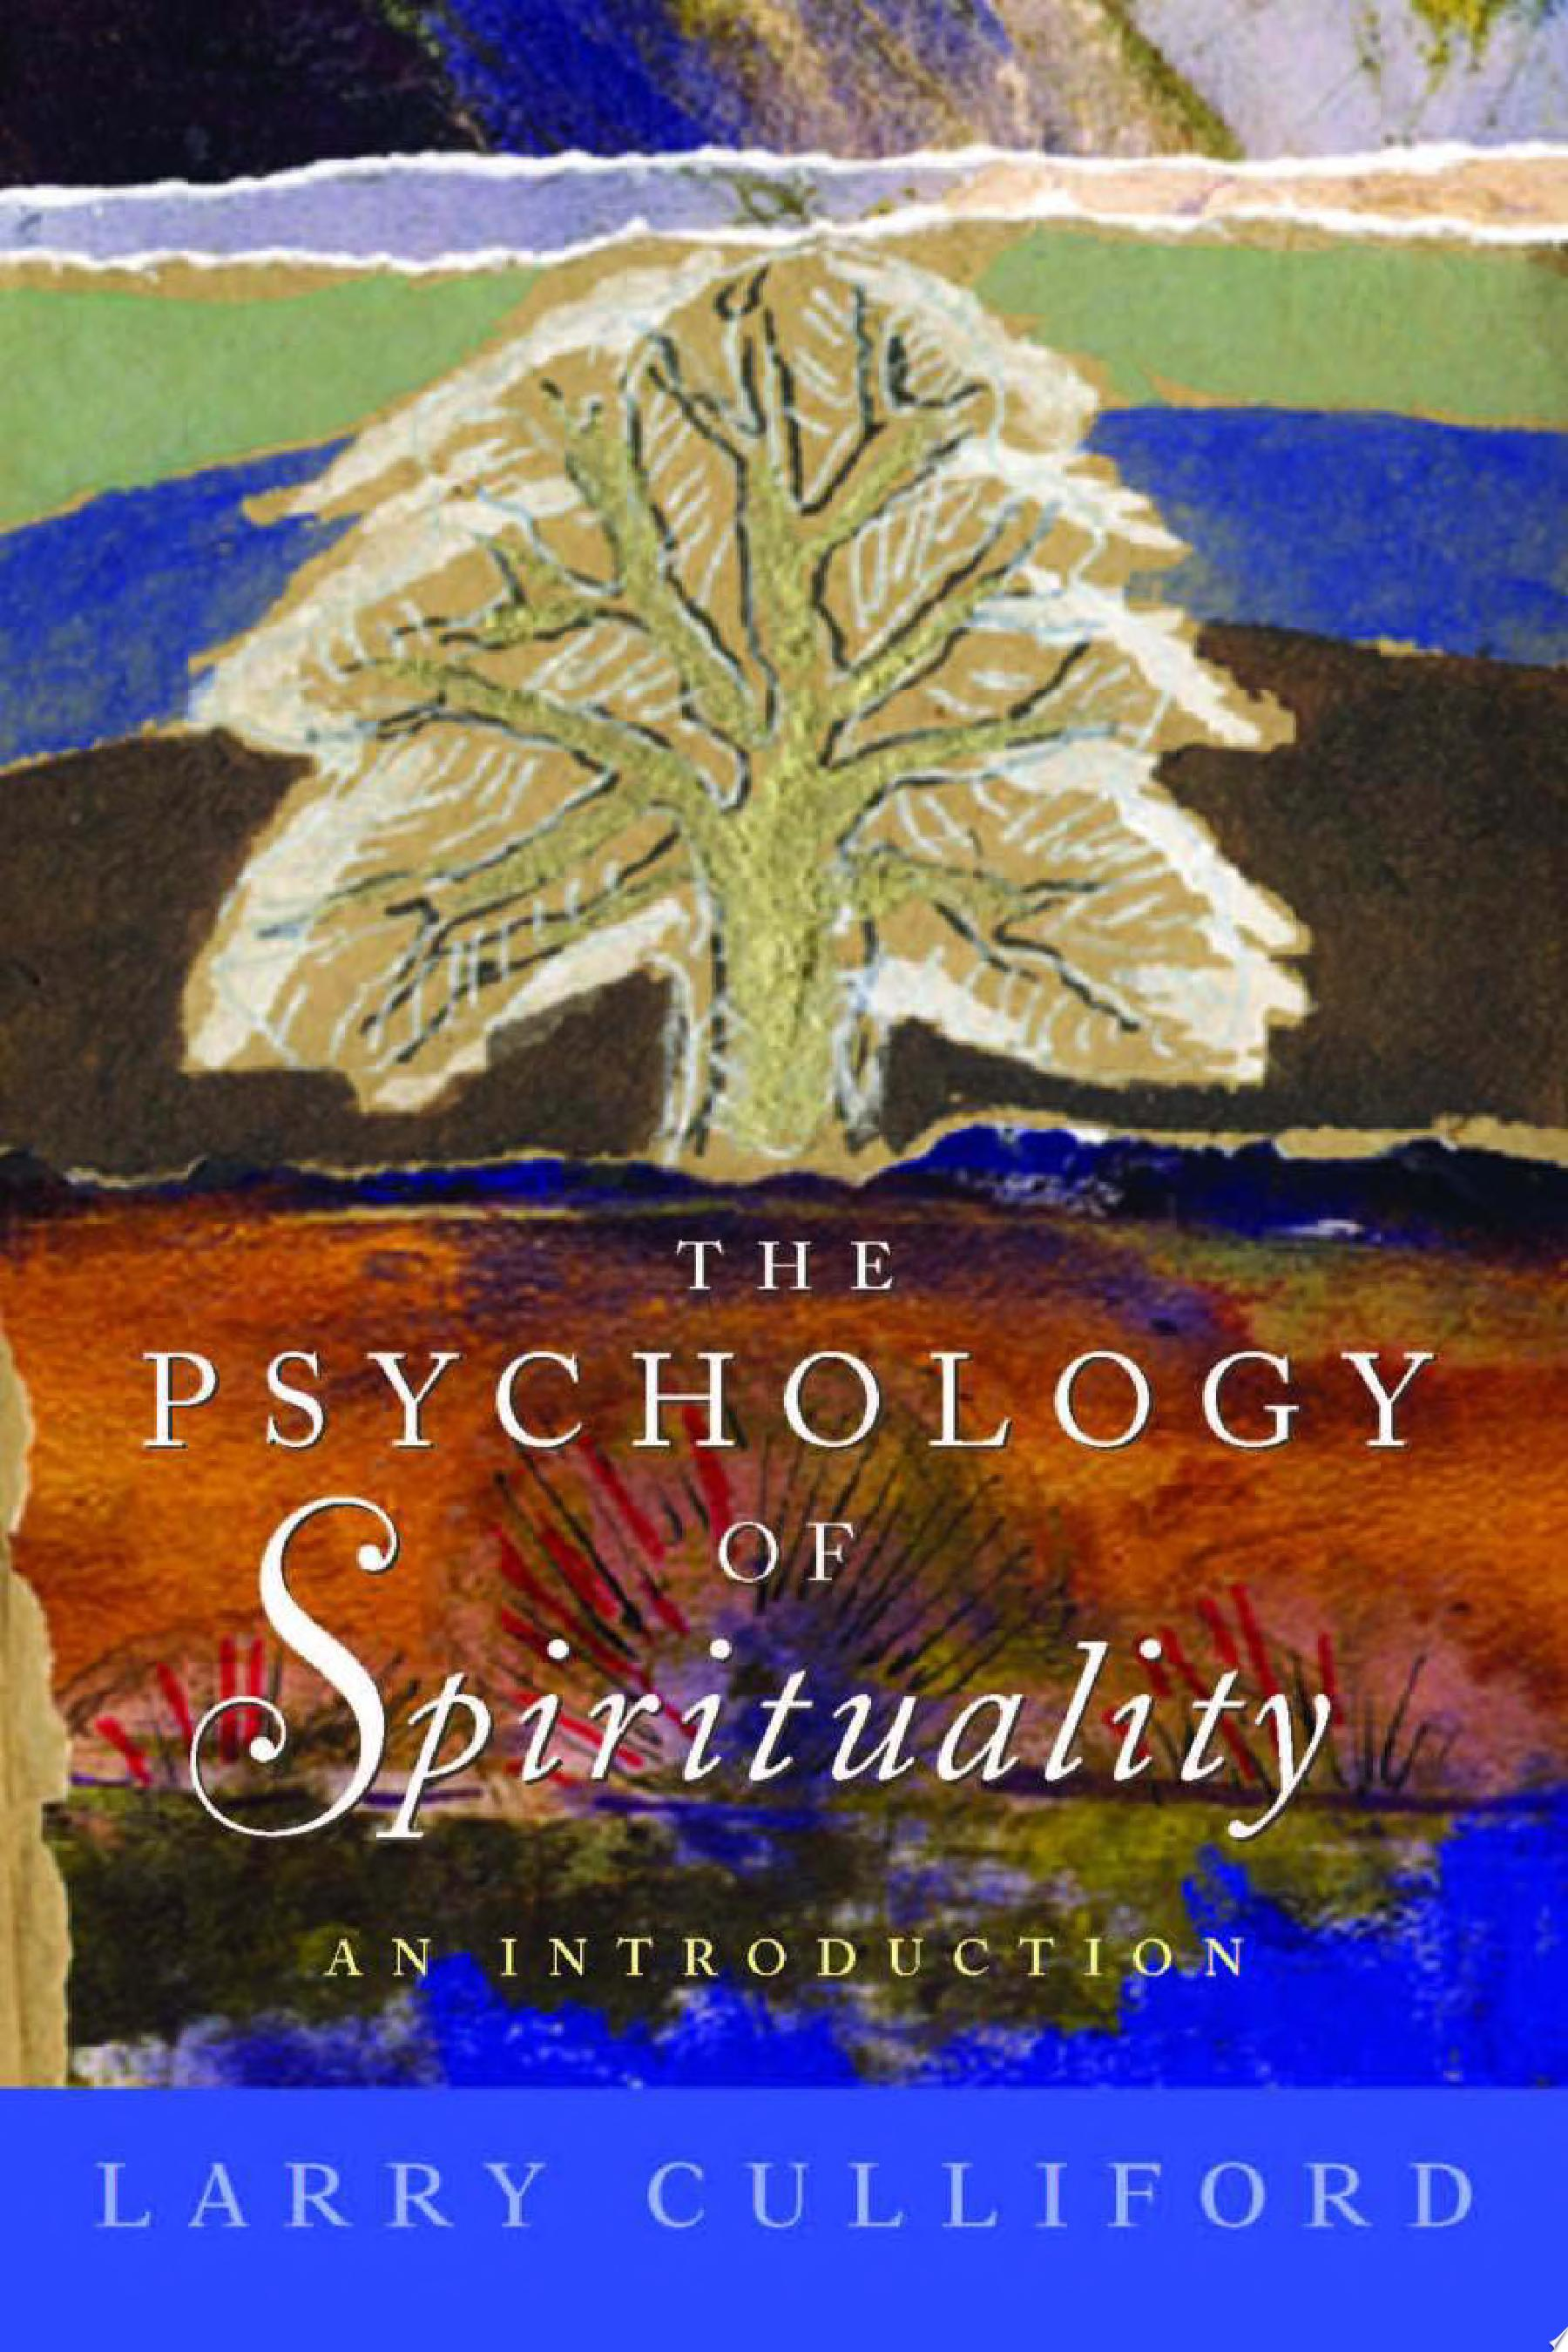 The Psychology of Spirituality